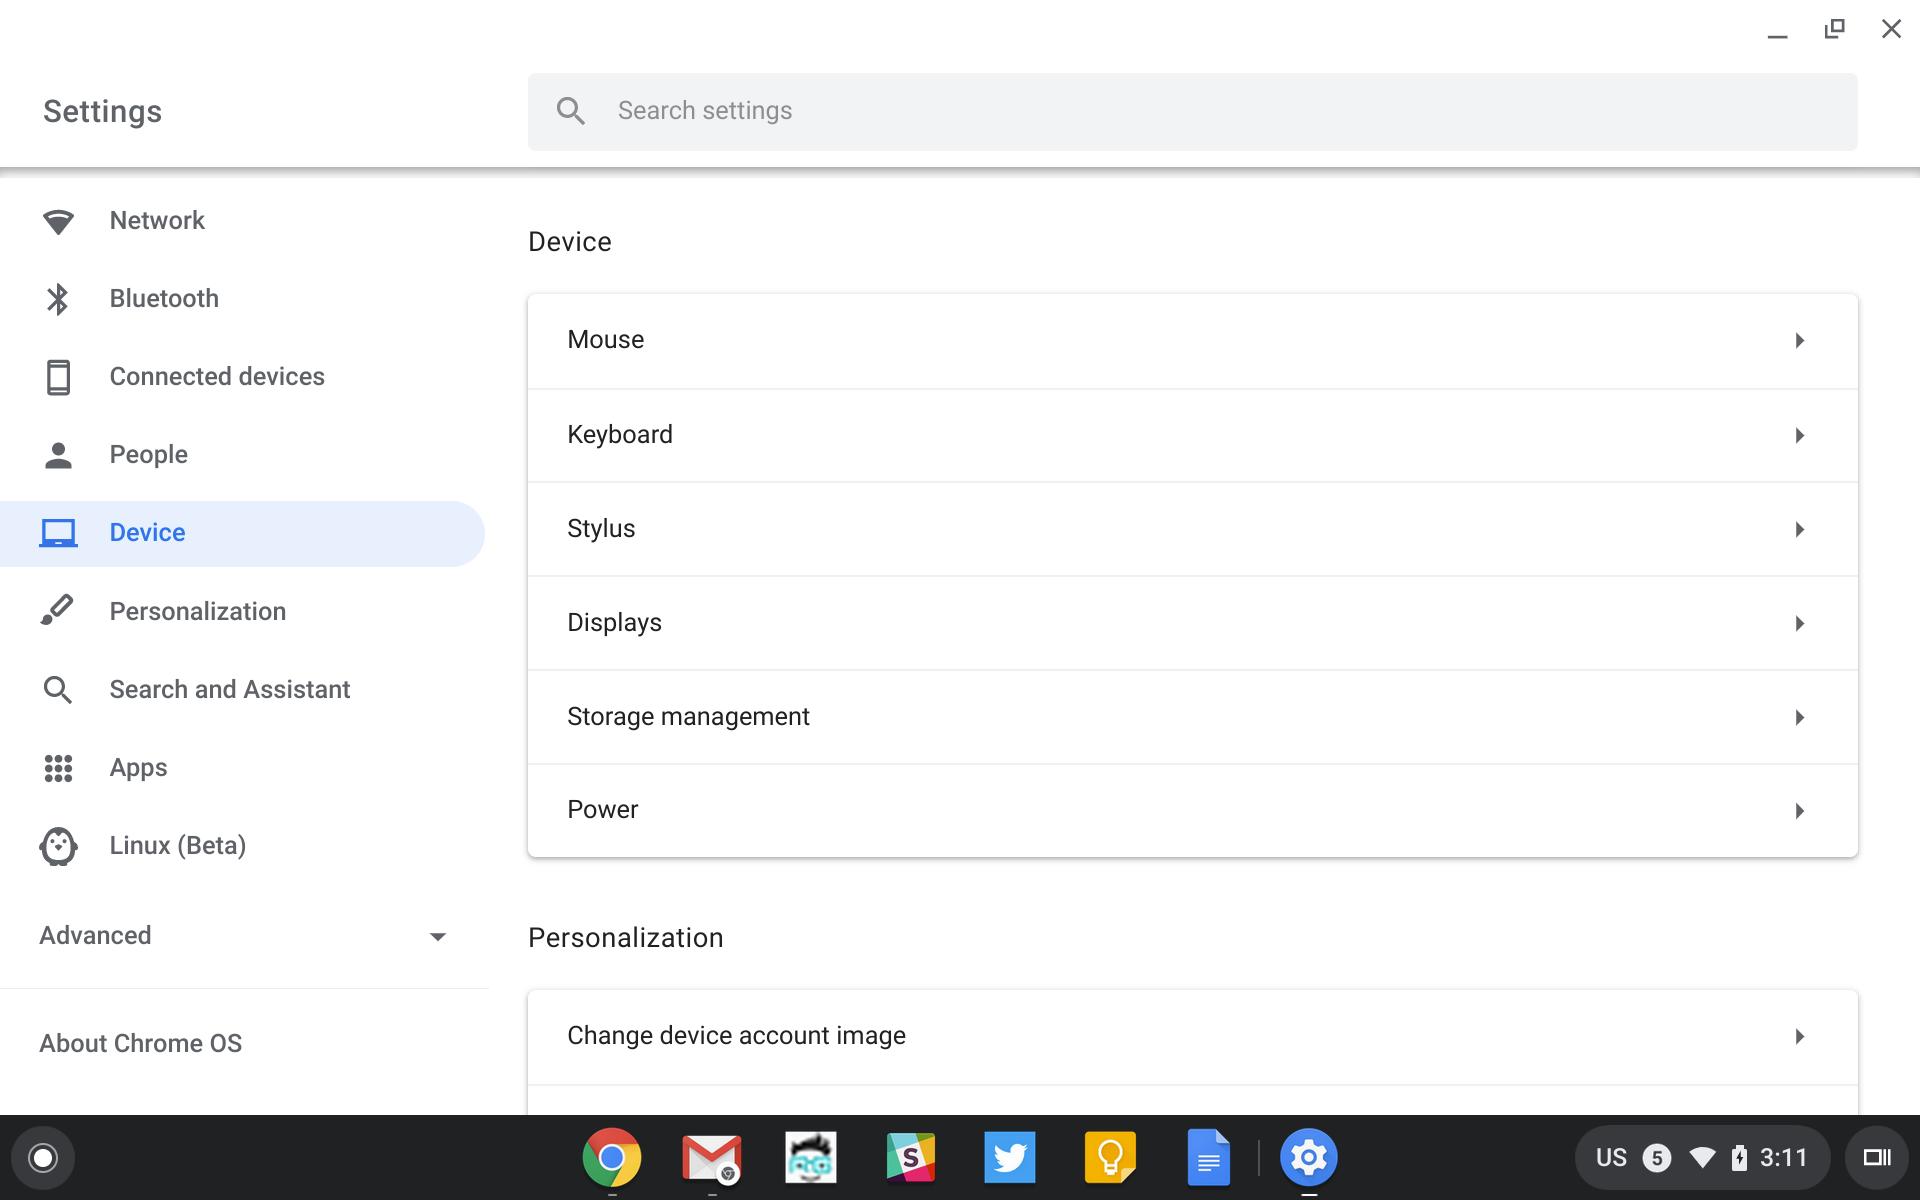 Chrome OS settings menu